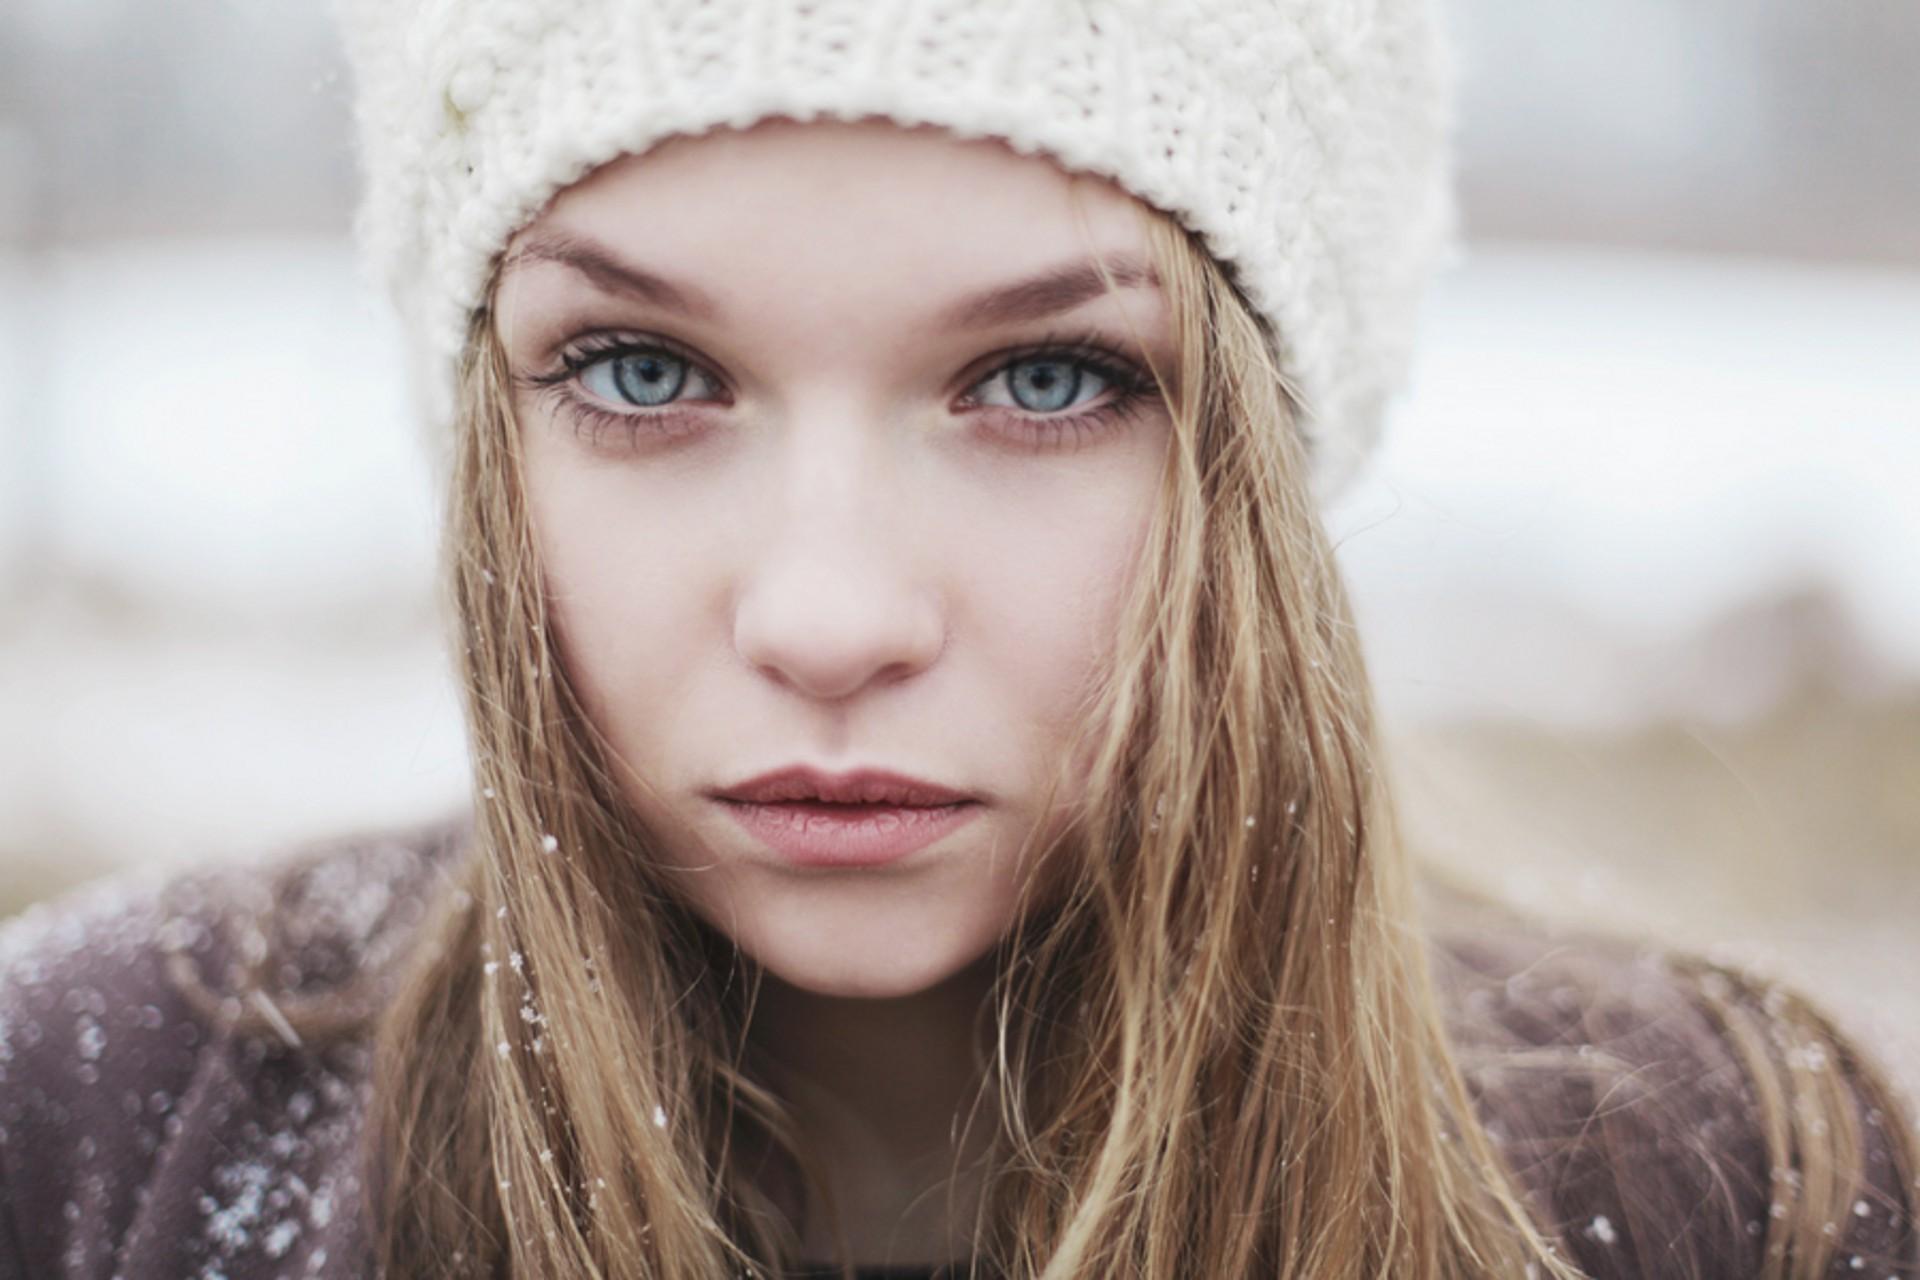 Women Blonde Blue Eyes Long Hair Wavy Hair Portrait: Hintergrundbilder : Gesicht, Frau, Modell-, Porträt, Blond